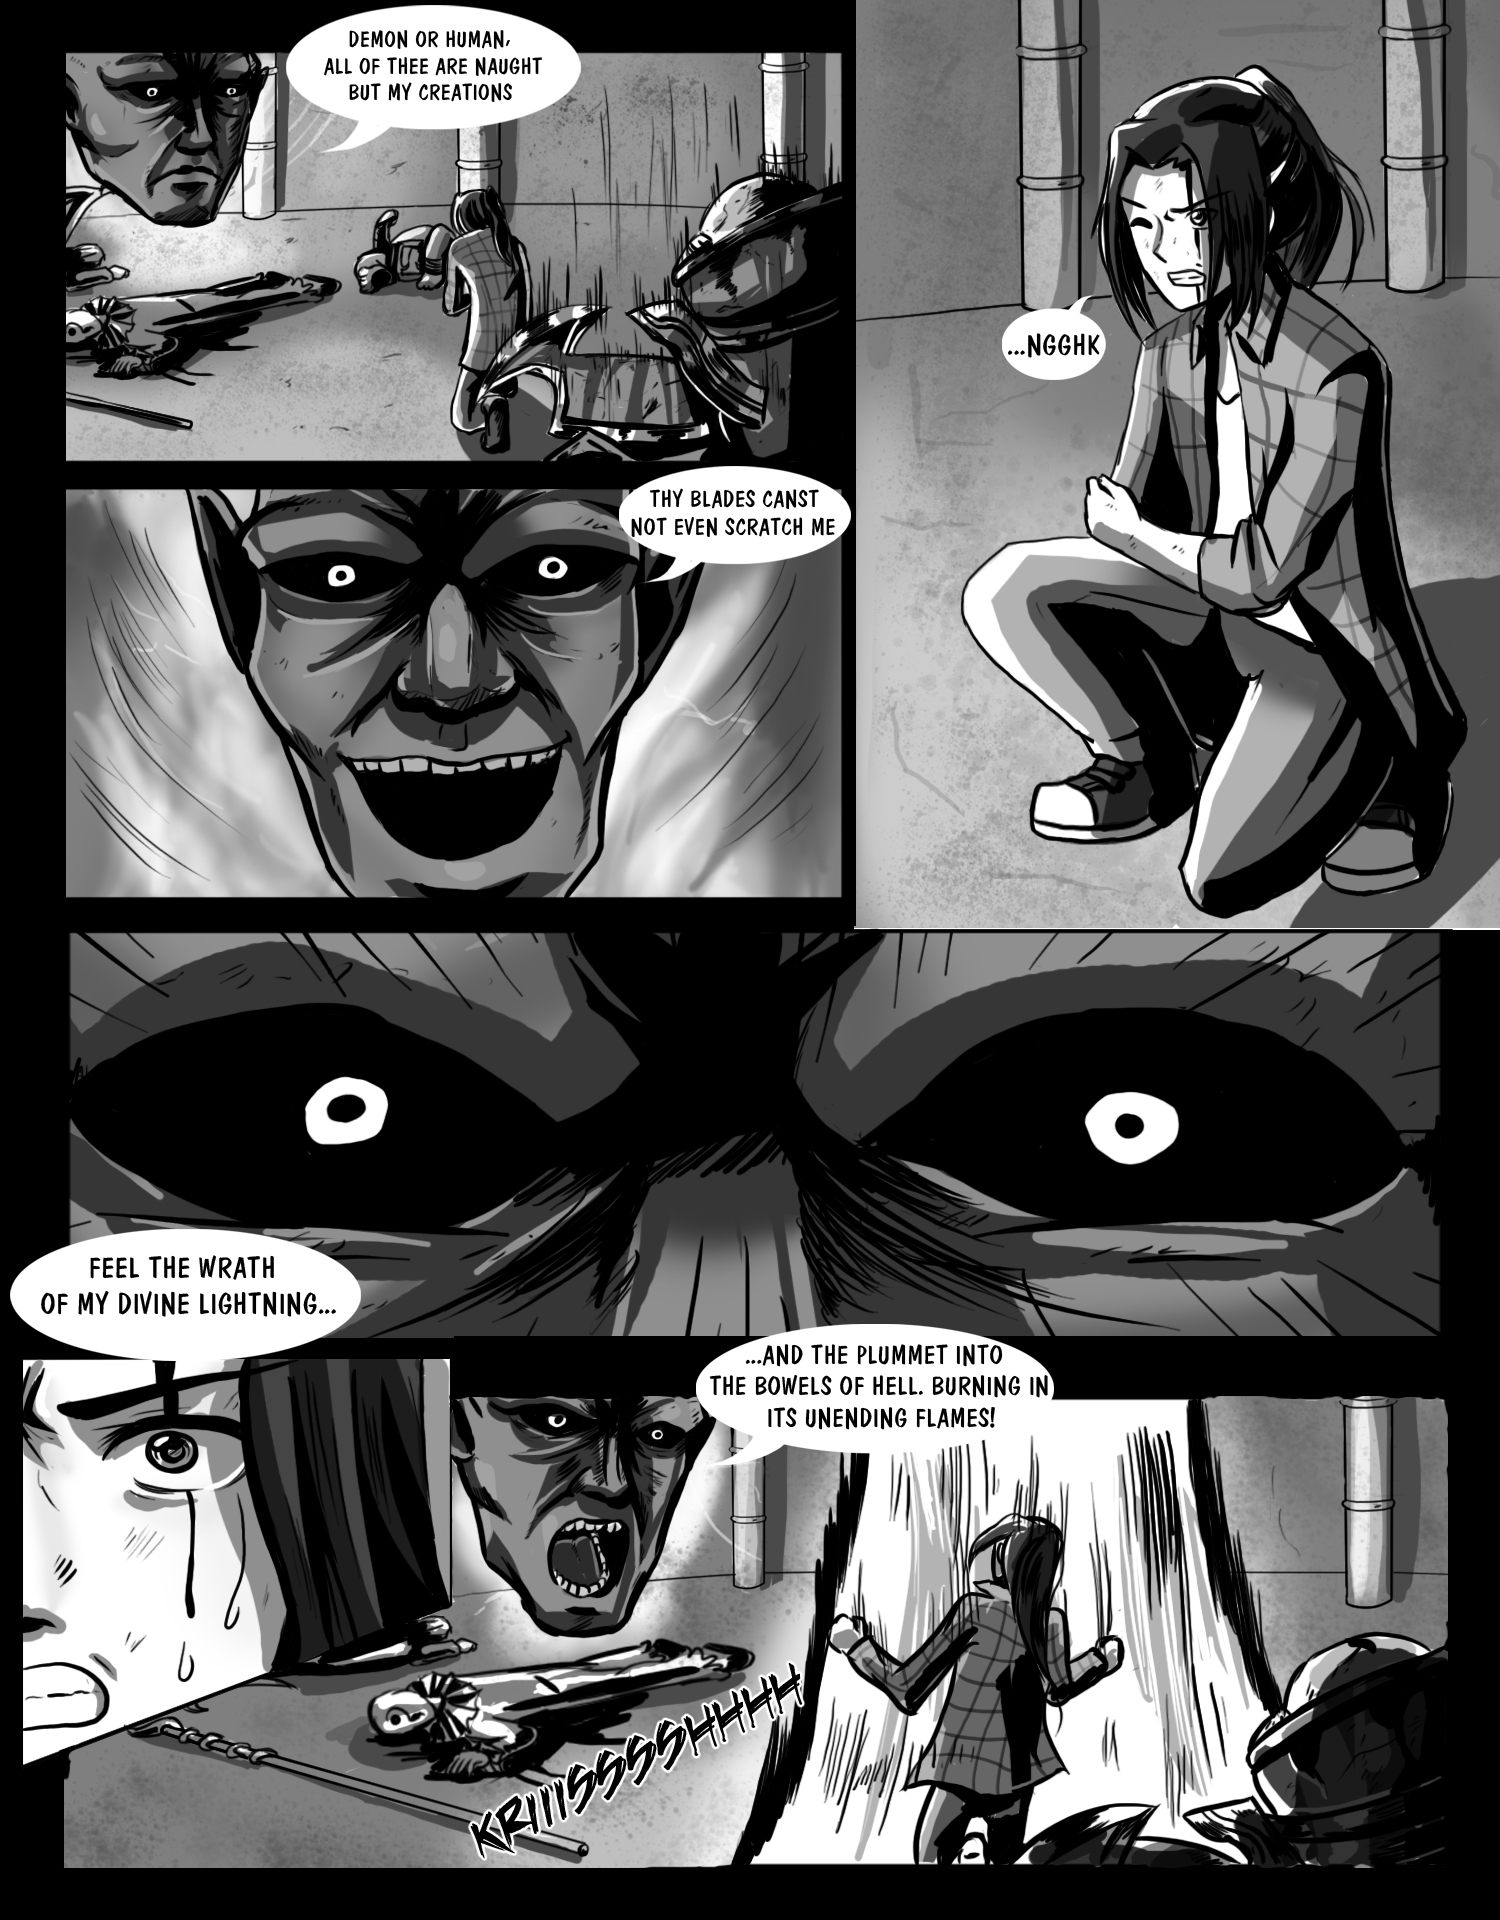 manga page sample